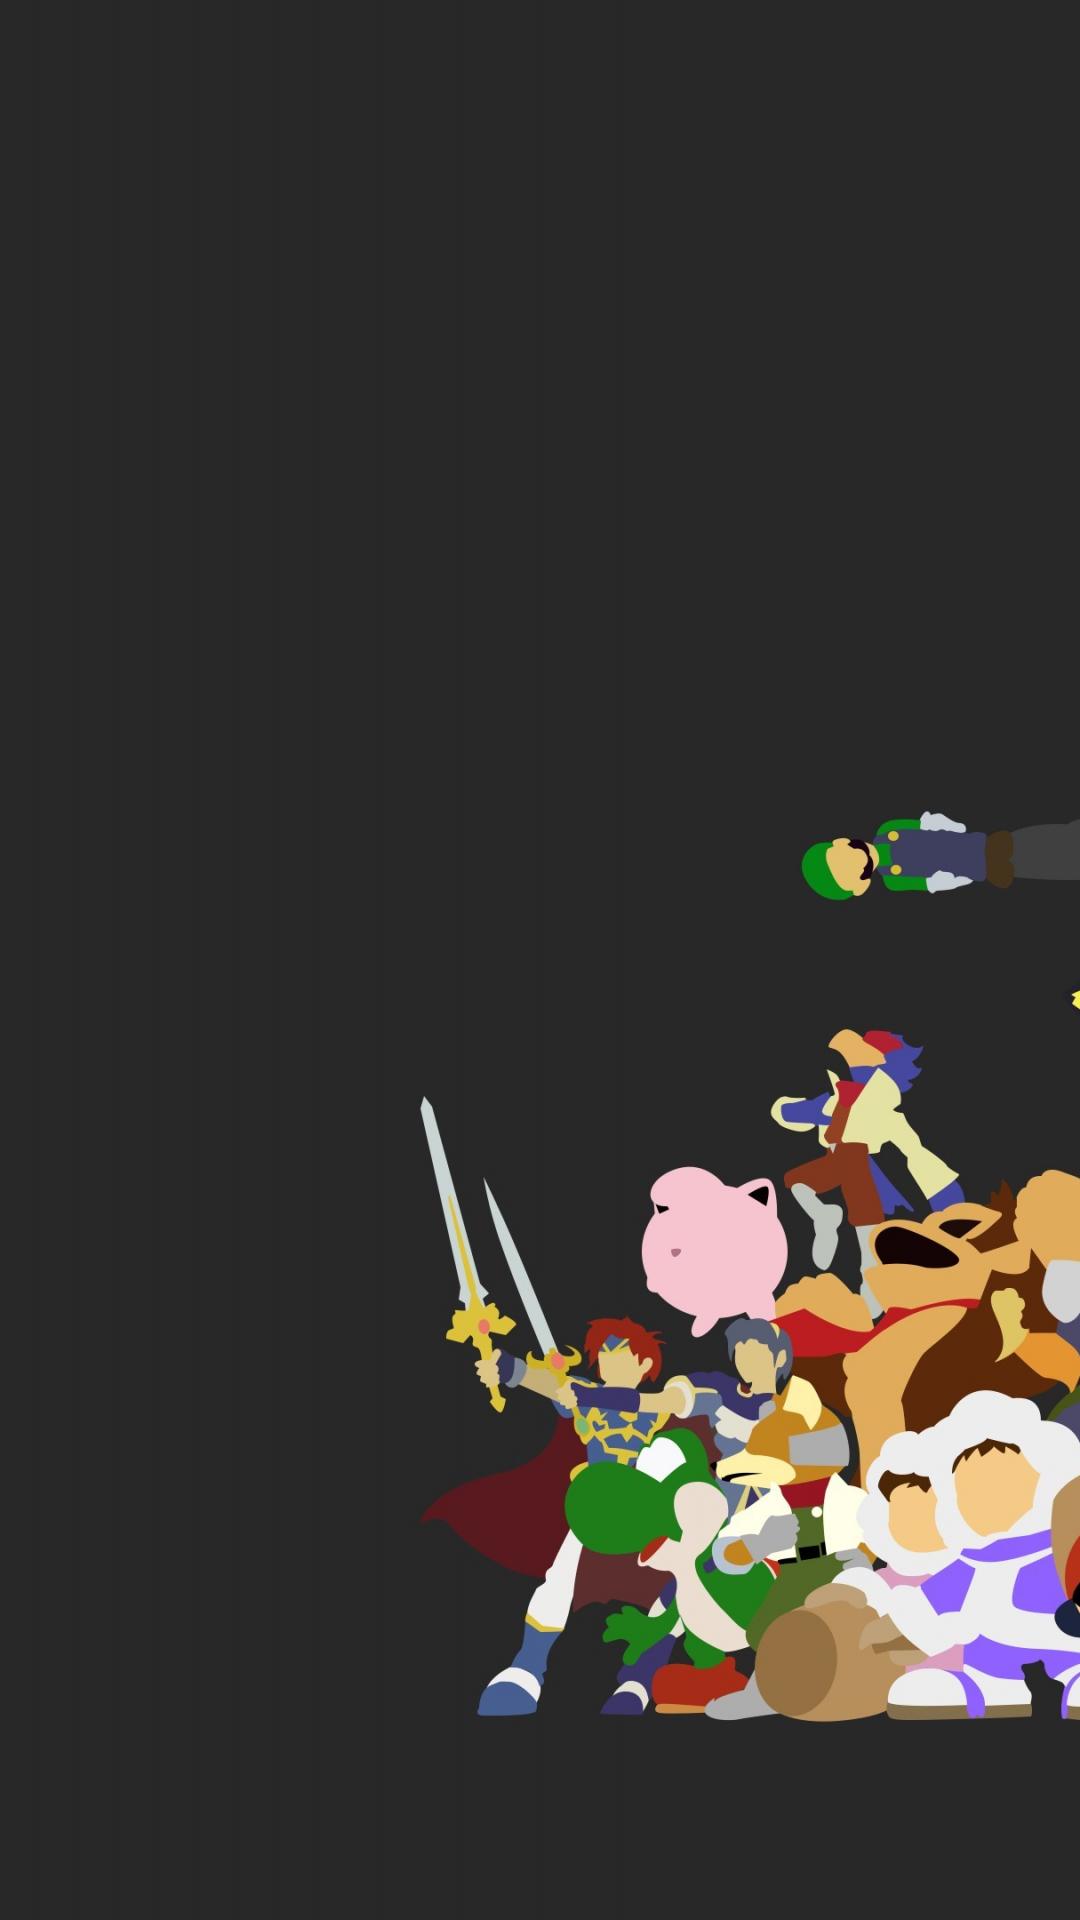 Free Download Super Smash Bros Hd Wallpaper 19 3840 X 2160